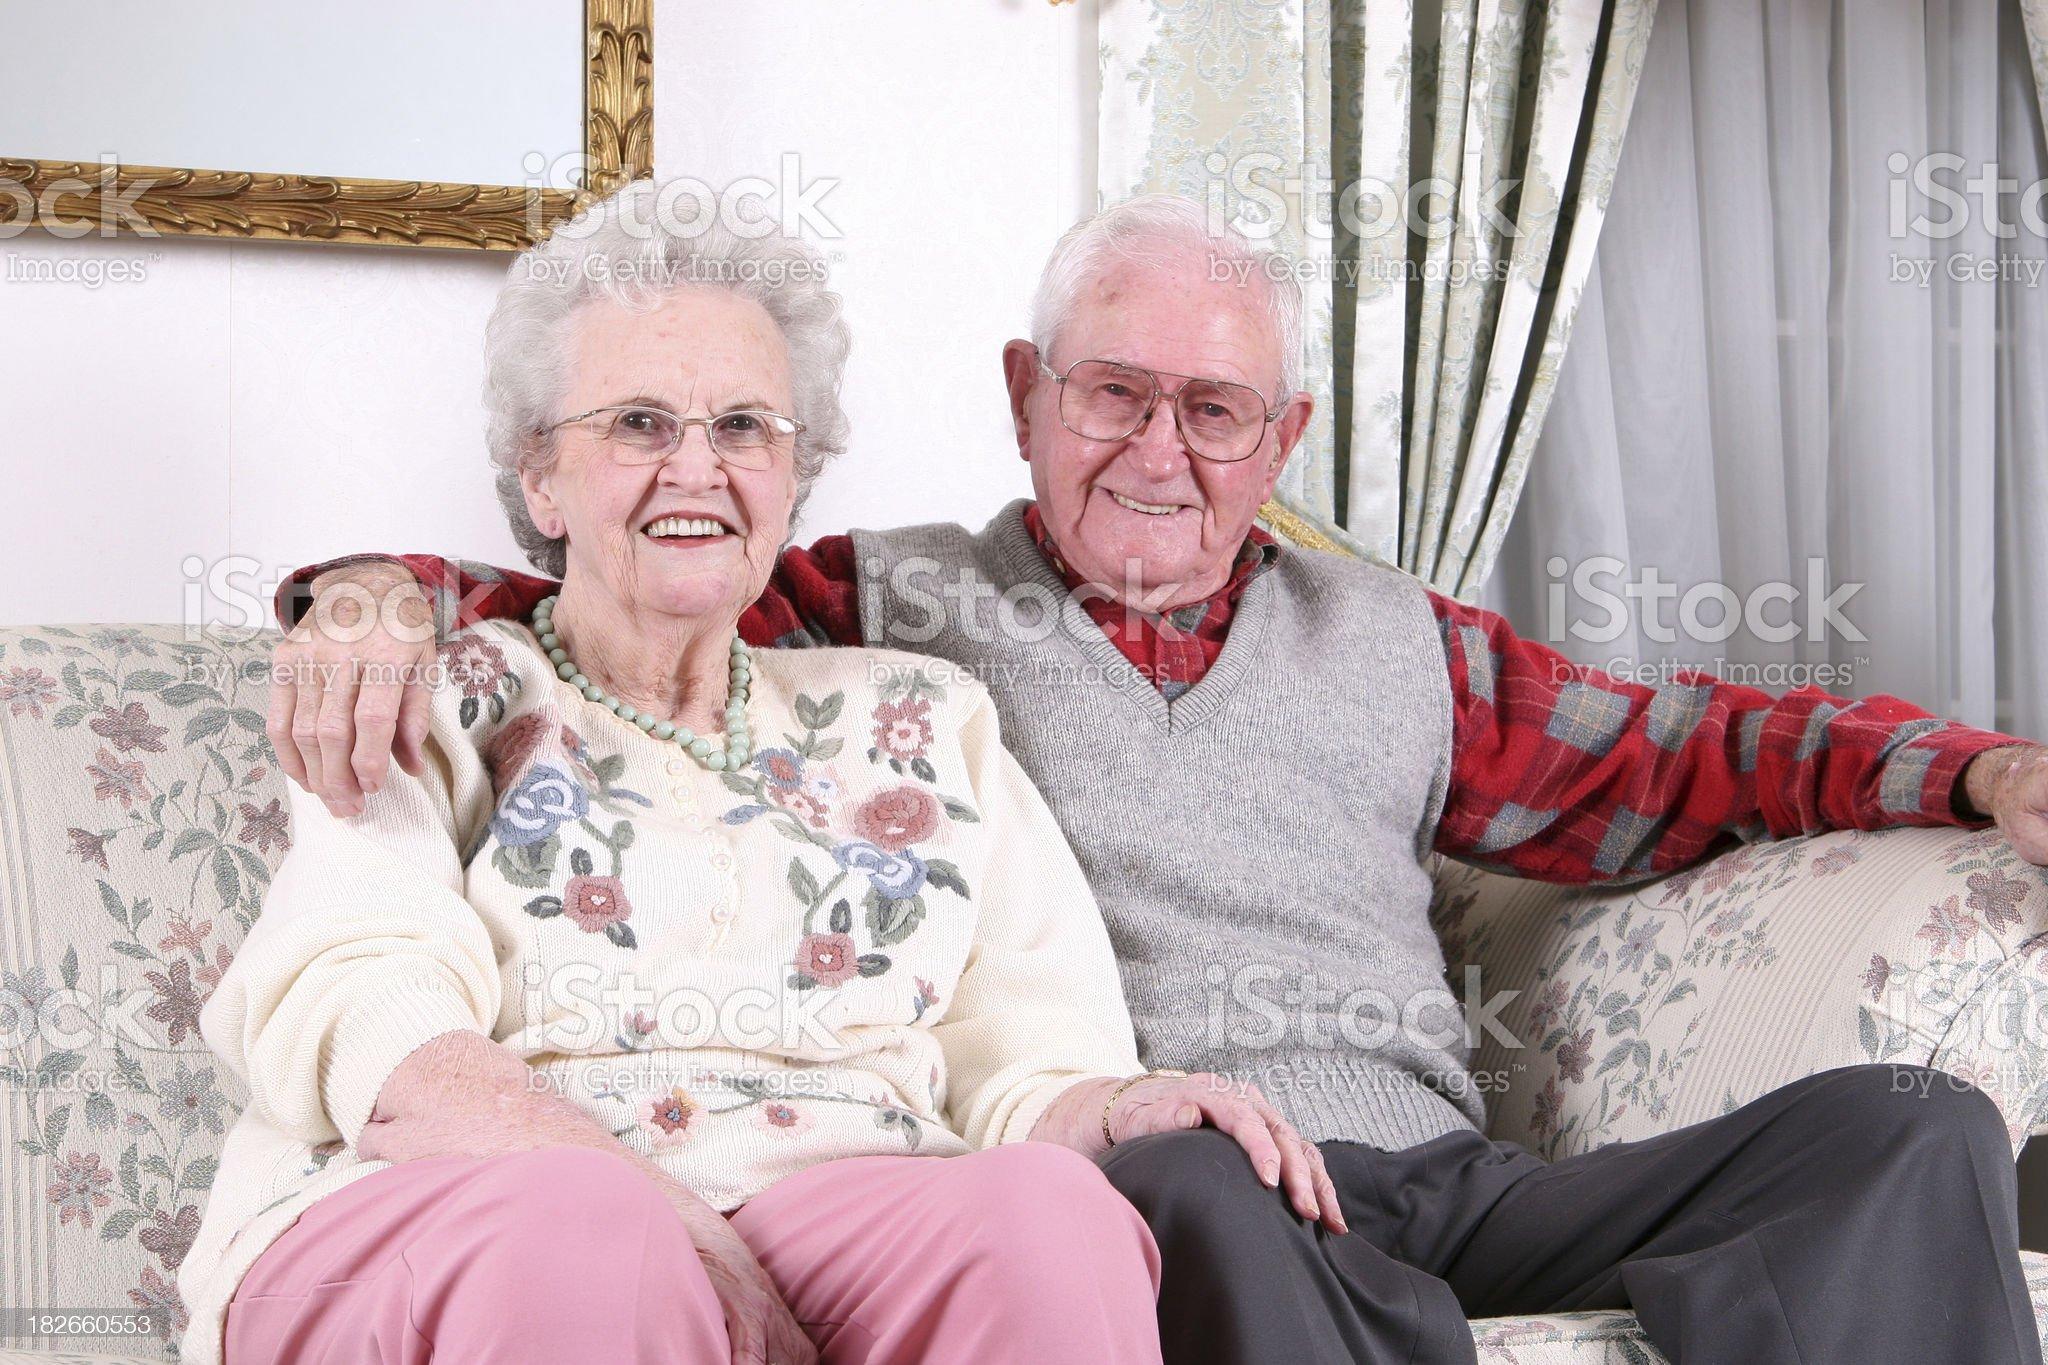 Seniors smiling. royalty-free stock photo